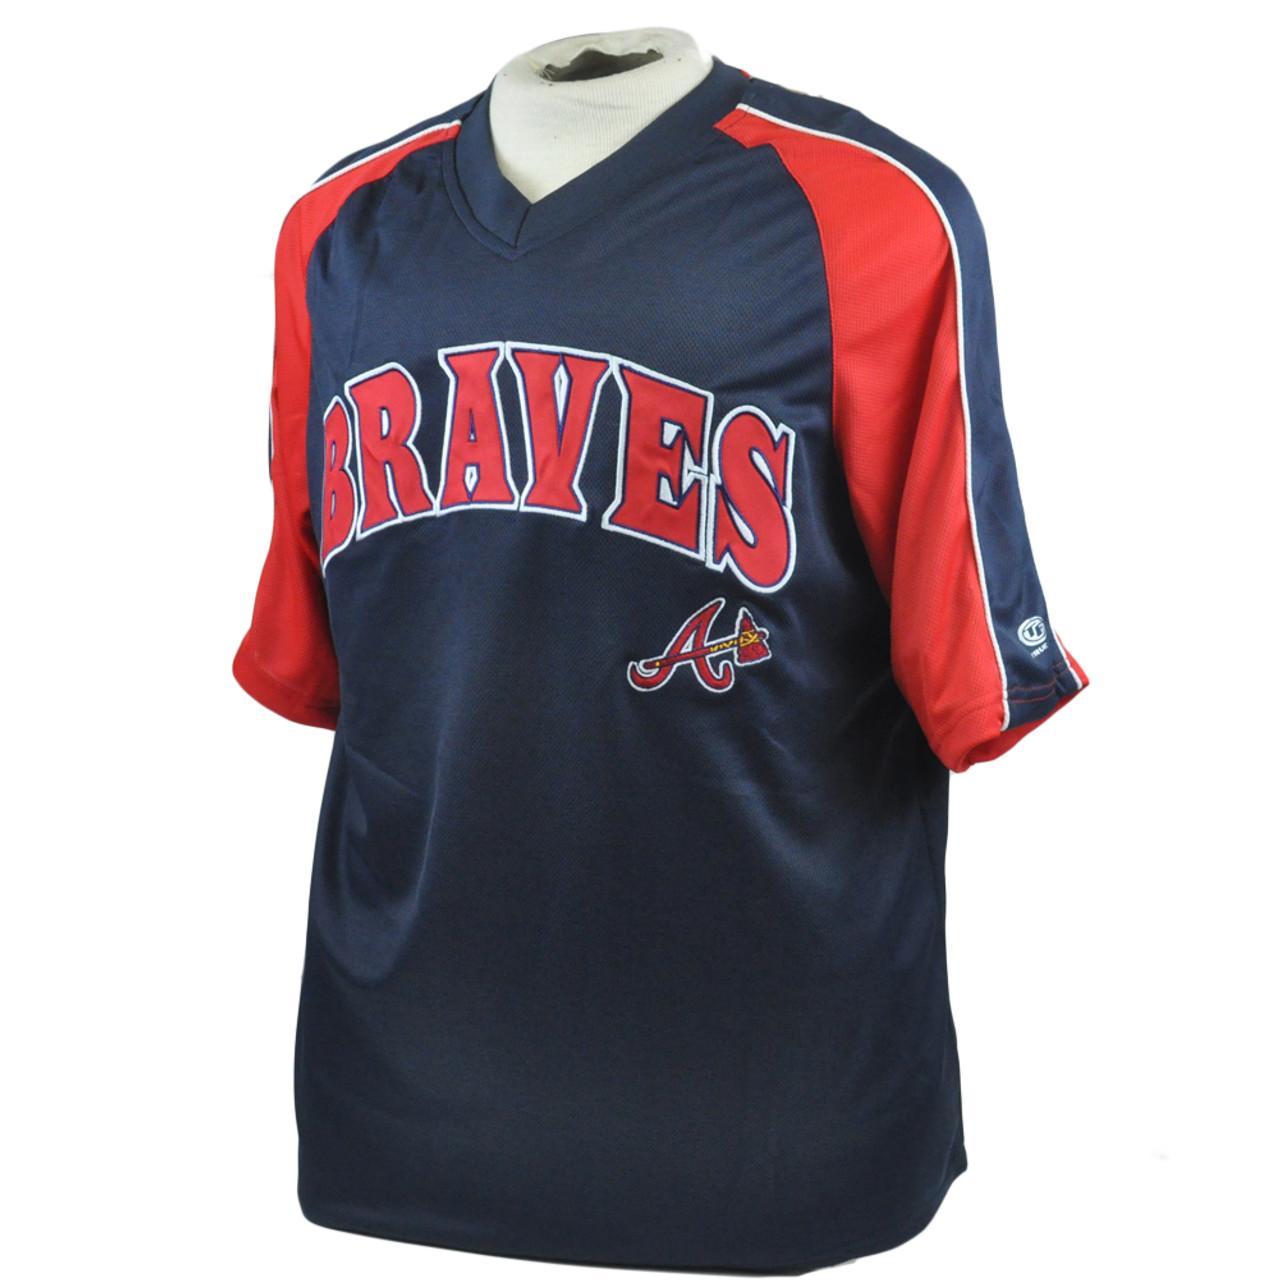 9692a431 MLB True Fan Atlanta Braves Lightweight Licensed Authentic Baseball Jersey  Large - Cap Store Online.com